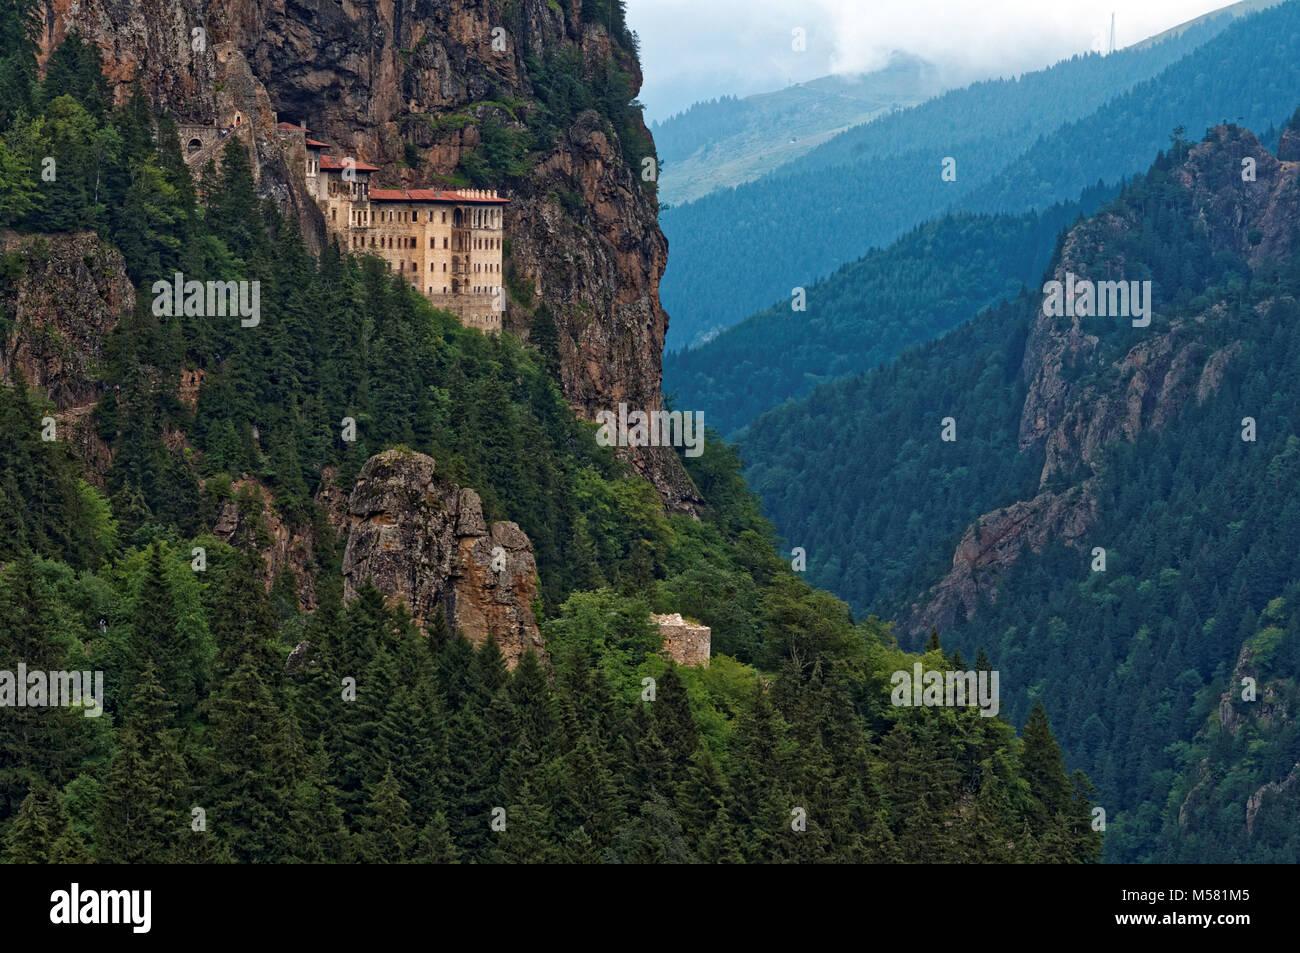 Sumela monastery near Trabzon, Turkey - Stock Image